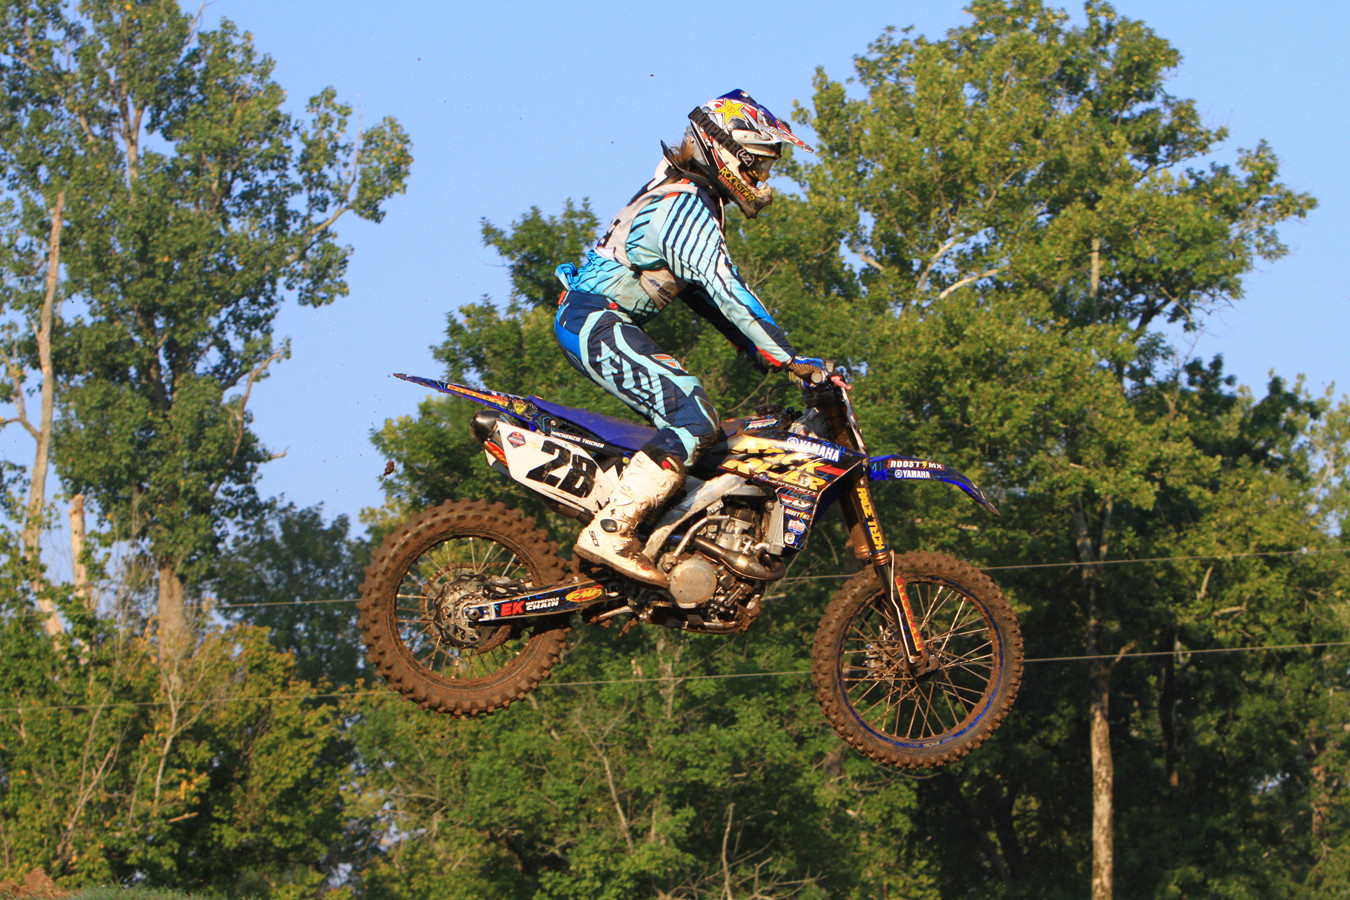 Mackenzie Tricker - Day 3: 2012 Red Bull AMA Amateur National Motocross Championships - Motocross Pictures - Vital MX